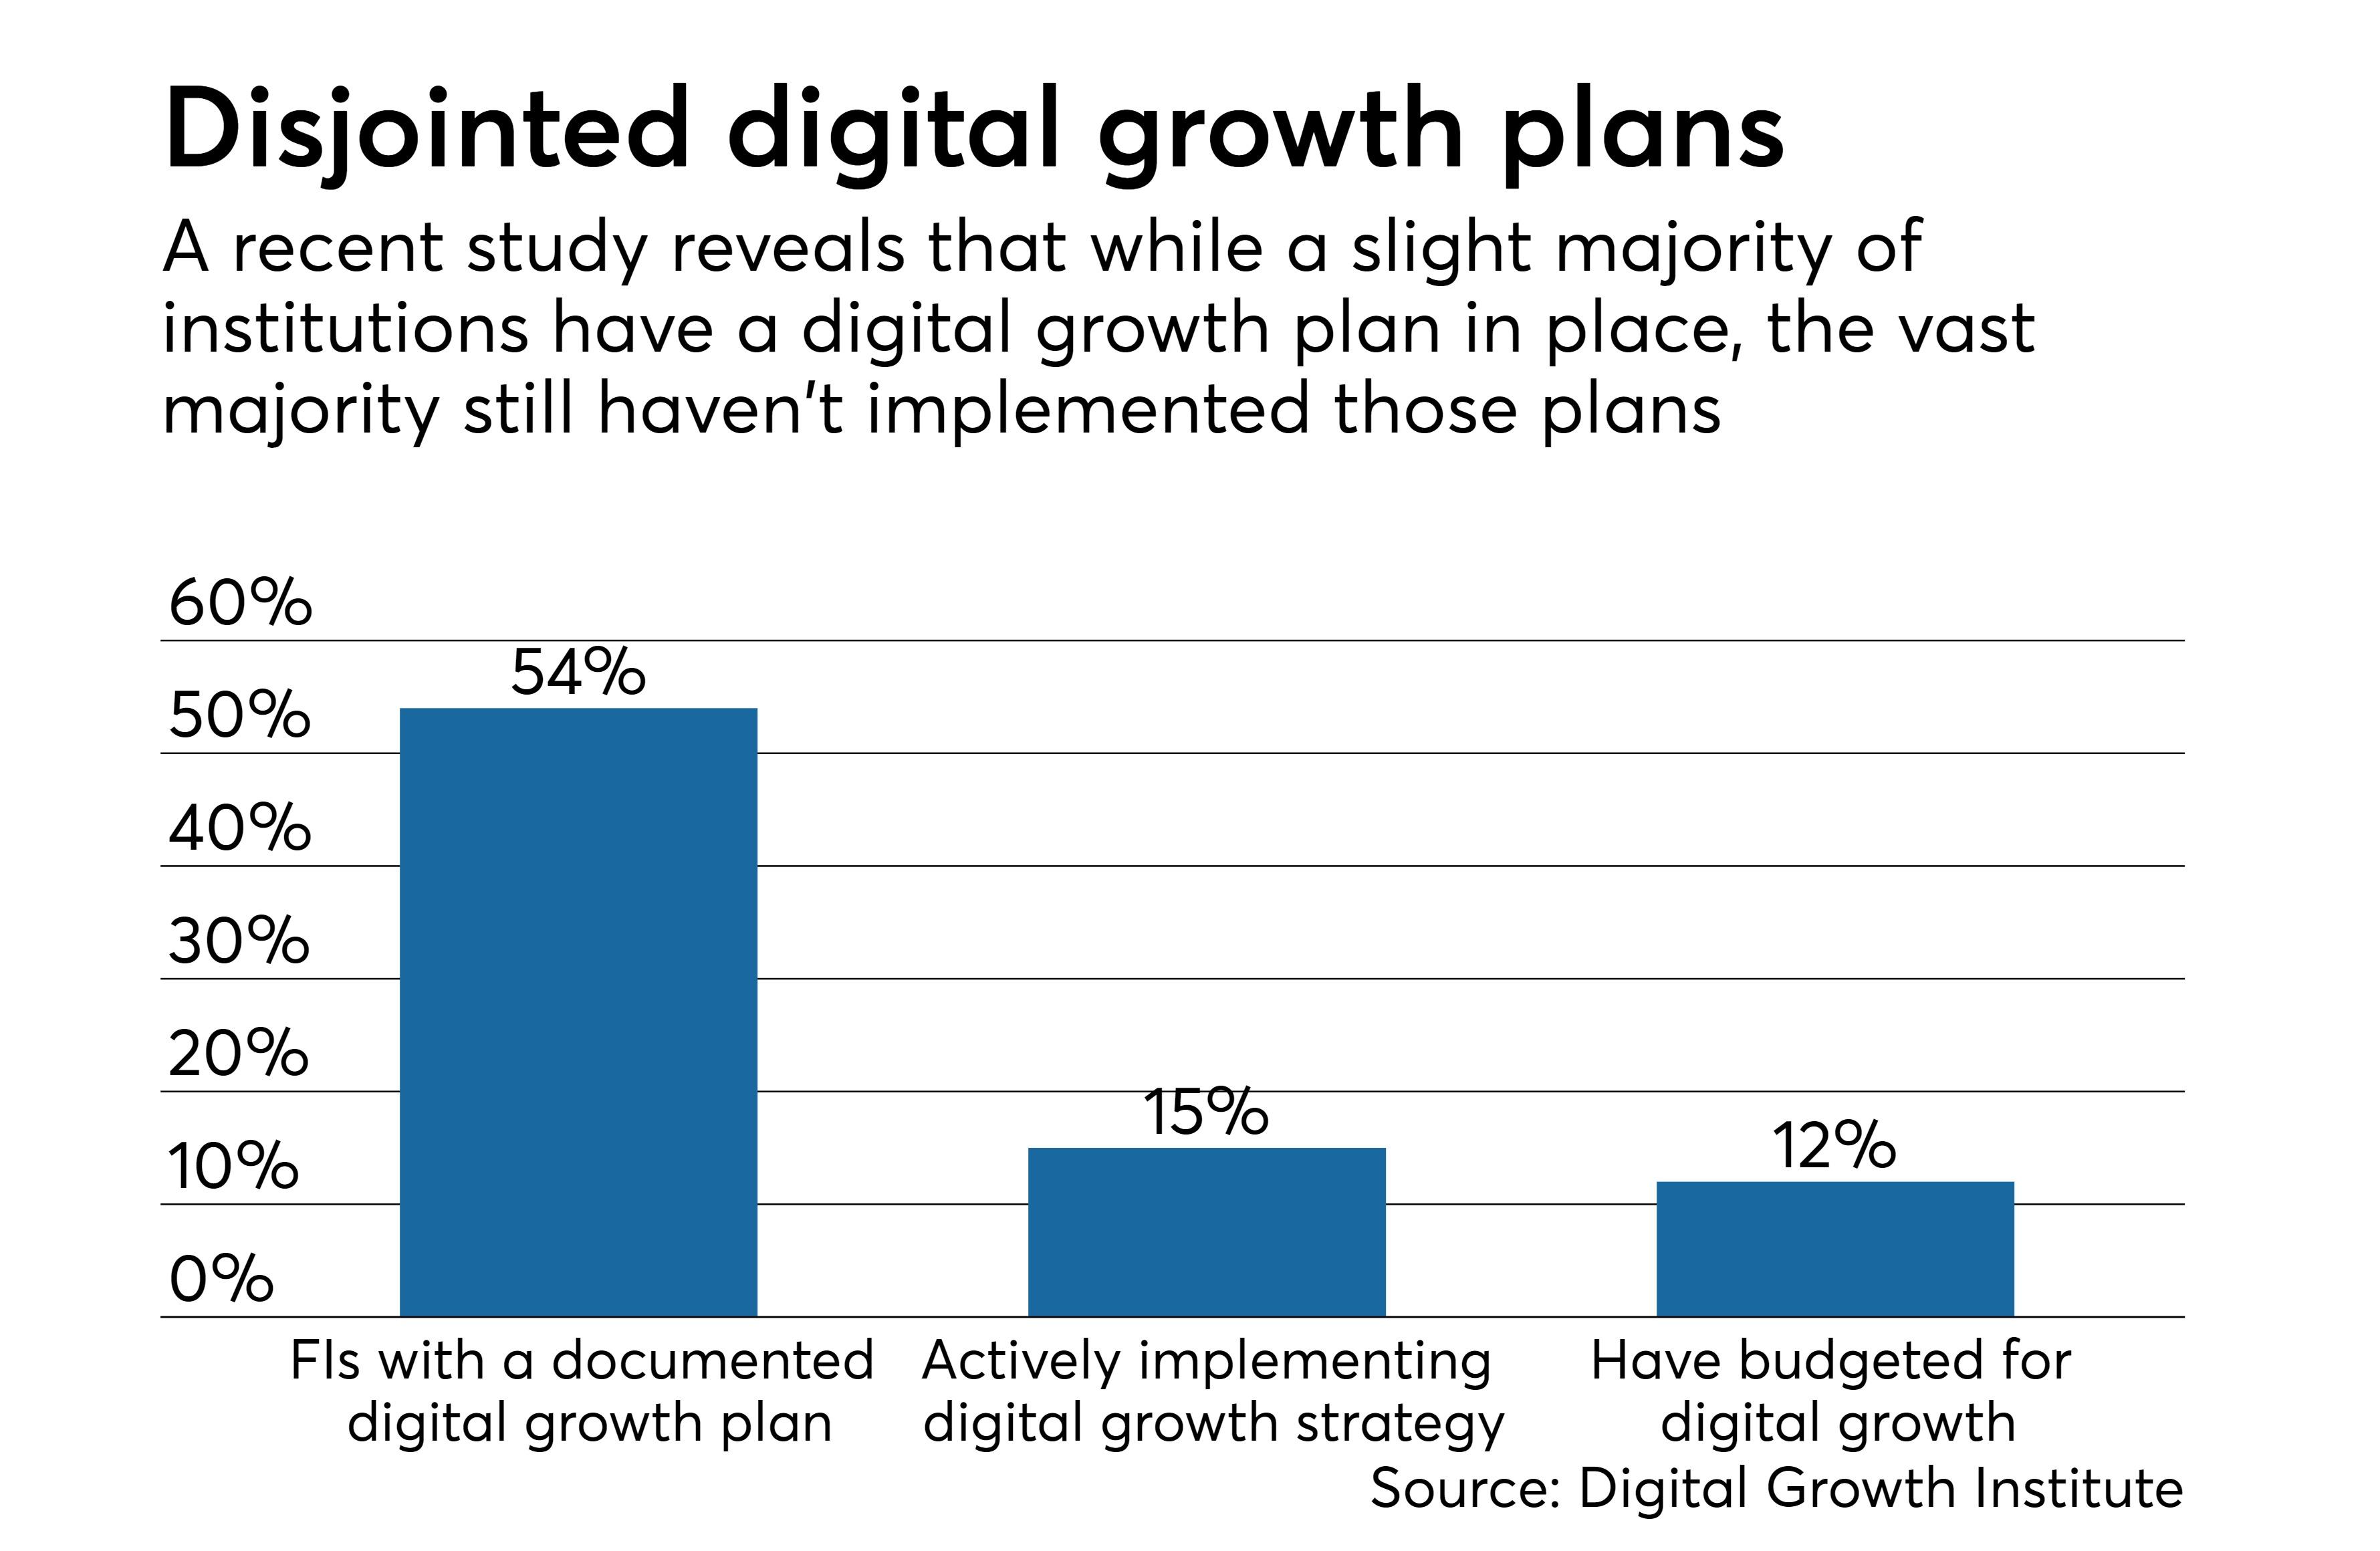 https://assets.sourcemedia.com/08/36/f9ab023c401998186476ed693911/digital-growth-strategies-cuj-083117.jpeg